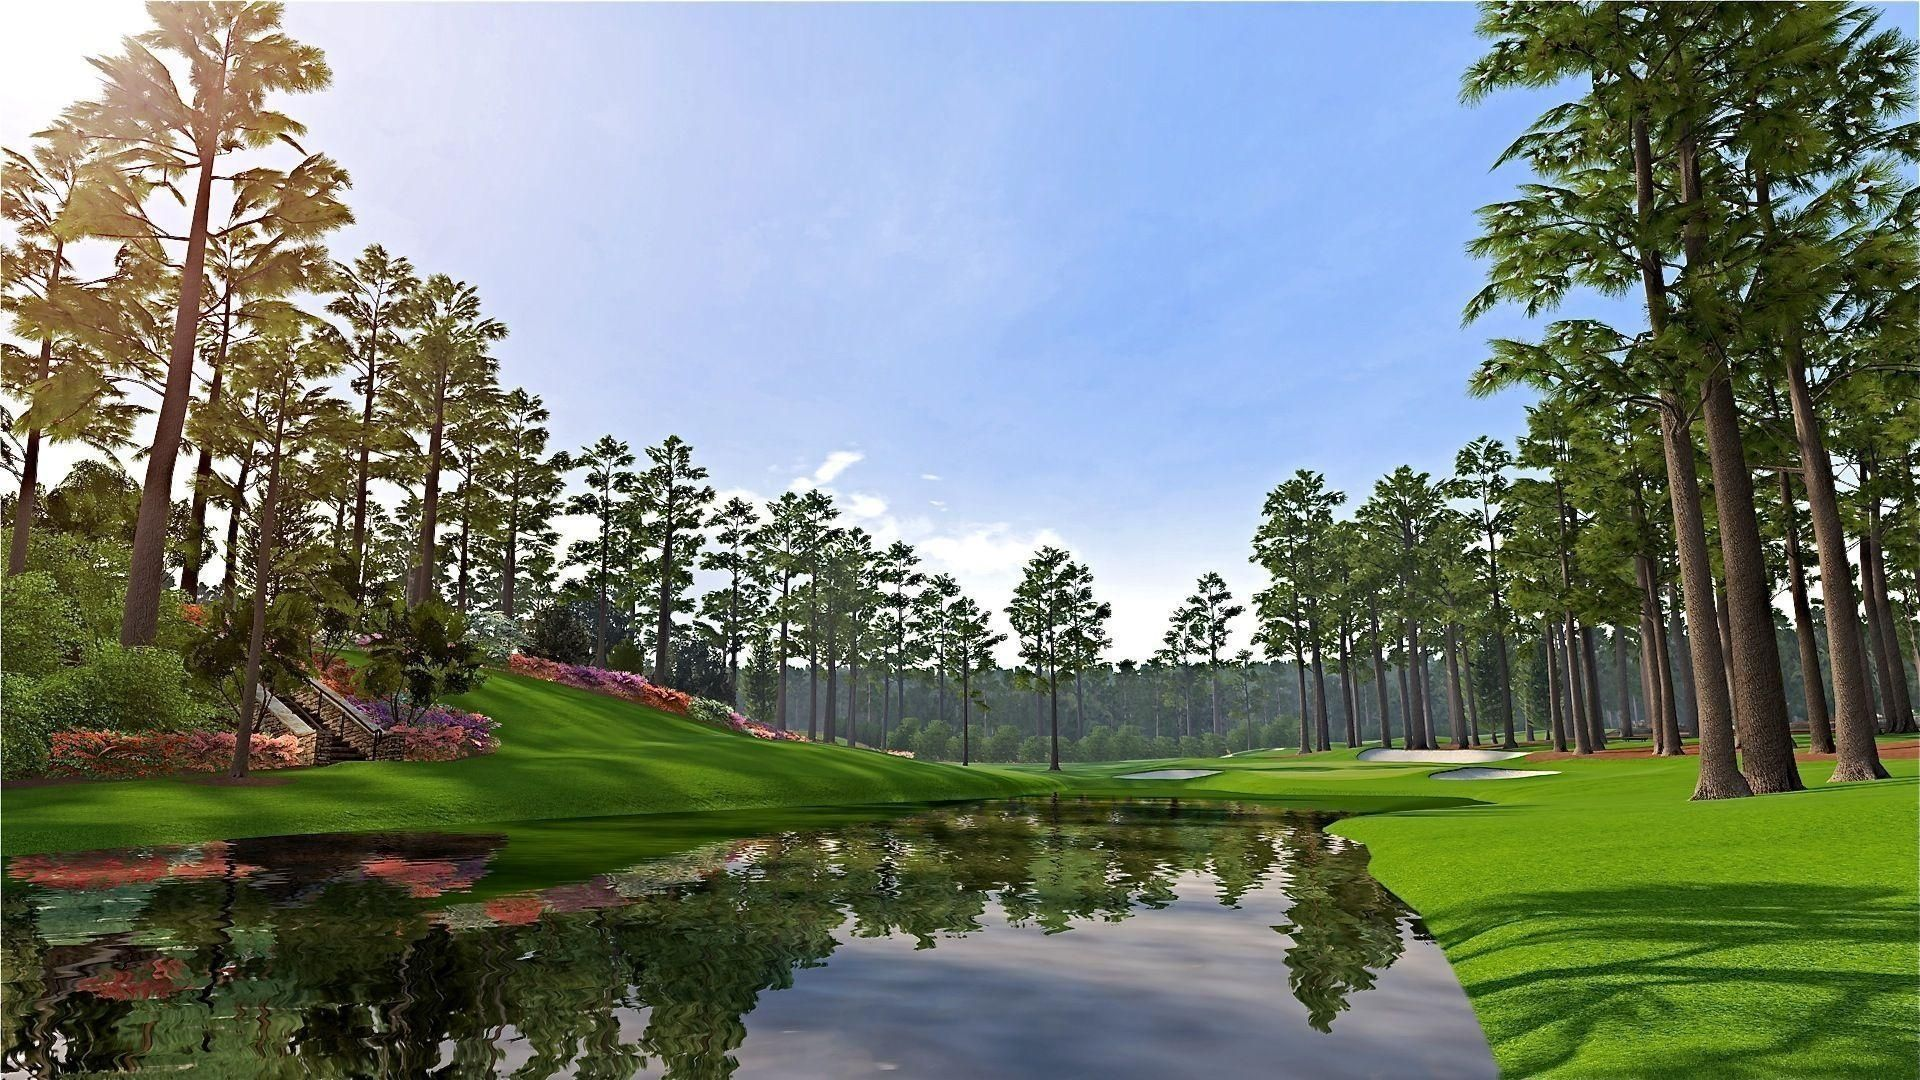 Desktop Backgrounds Golf Courses Wallpapers Hd Free 386688 Golf Courses Myrtle Beach Golf Golf